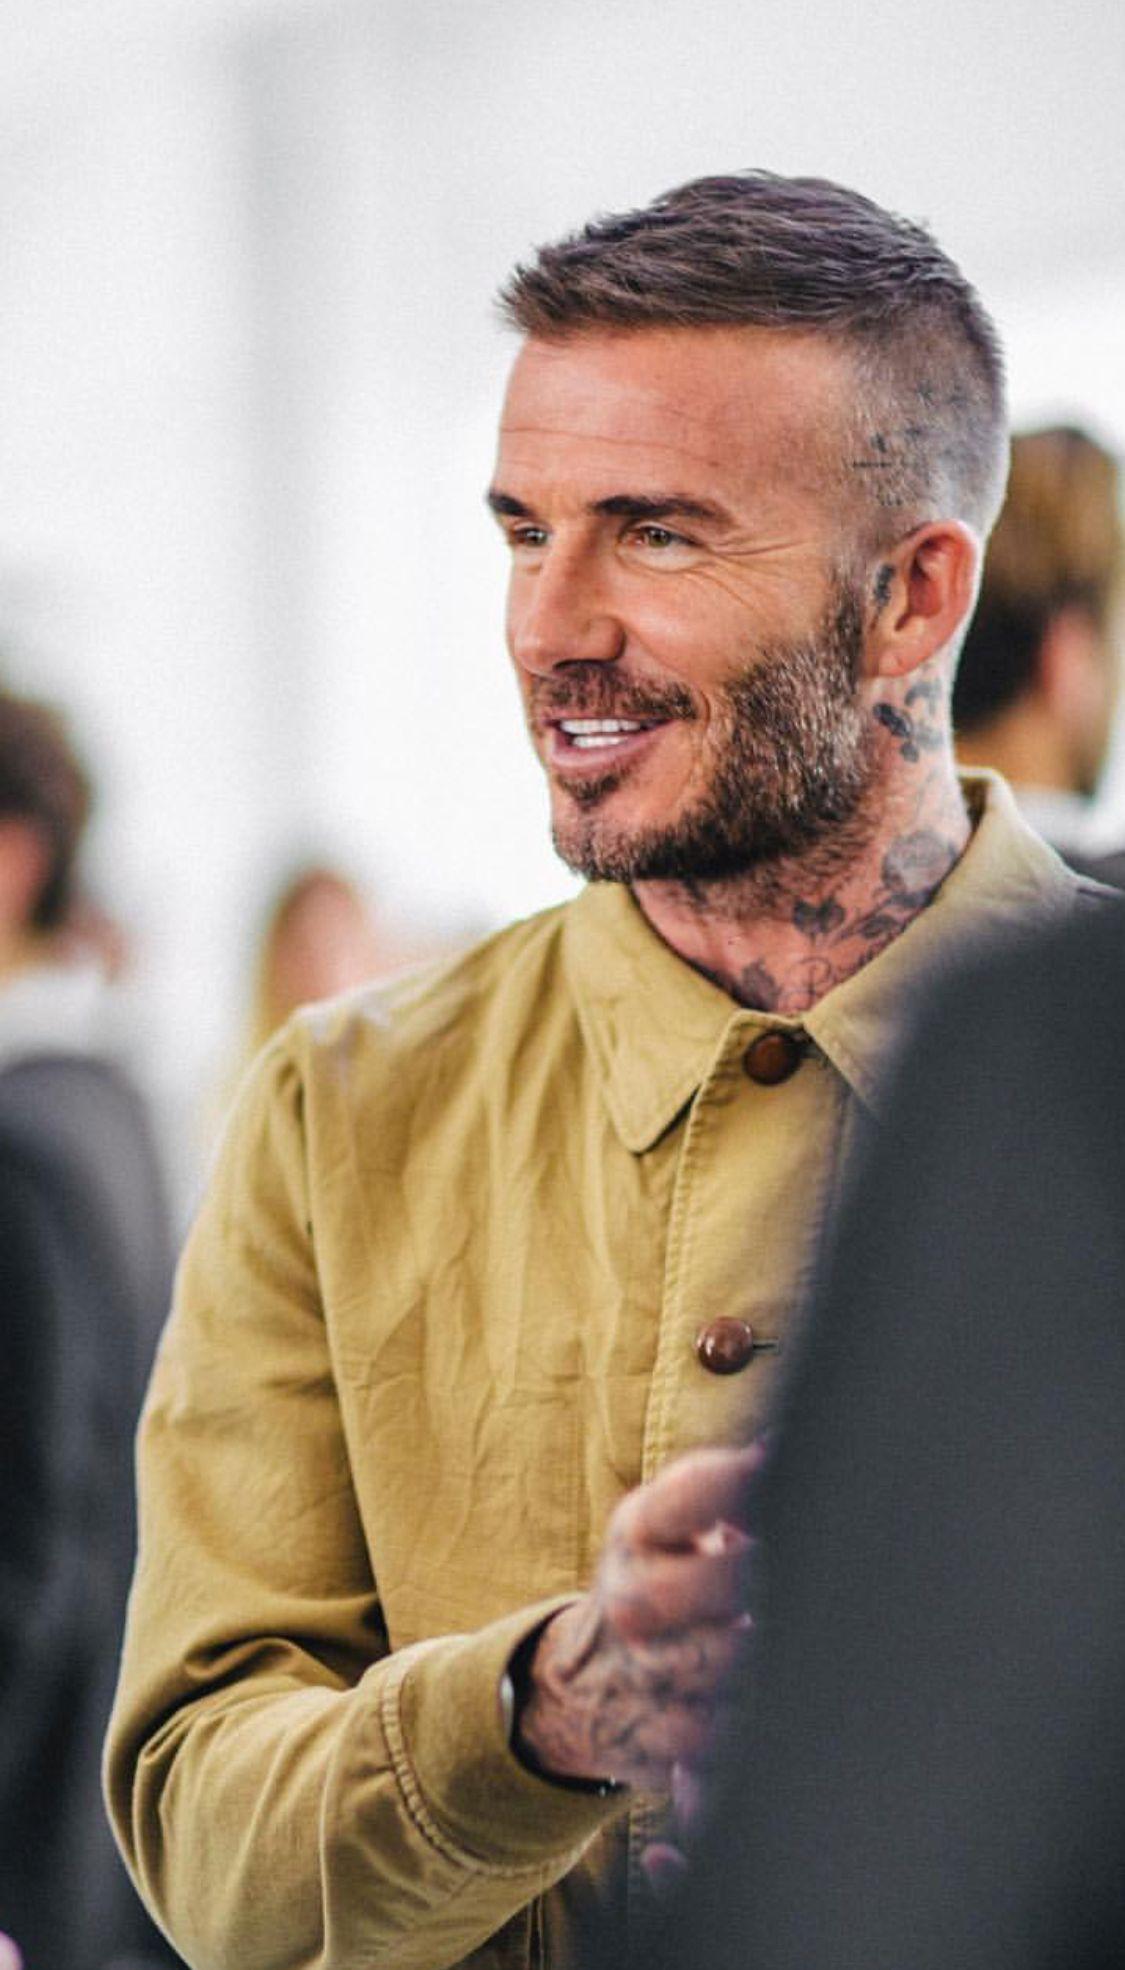 David Beckham Kent And Curwen David Beckham Hairstyle Beckham Hair David Beckham Haircut